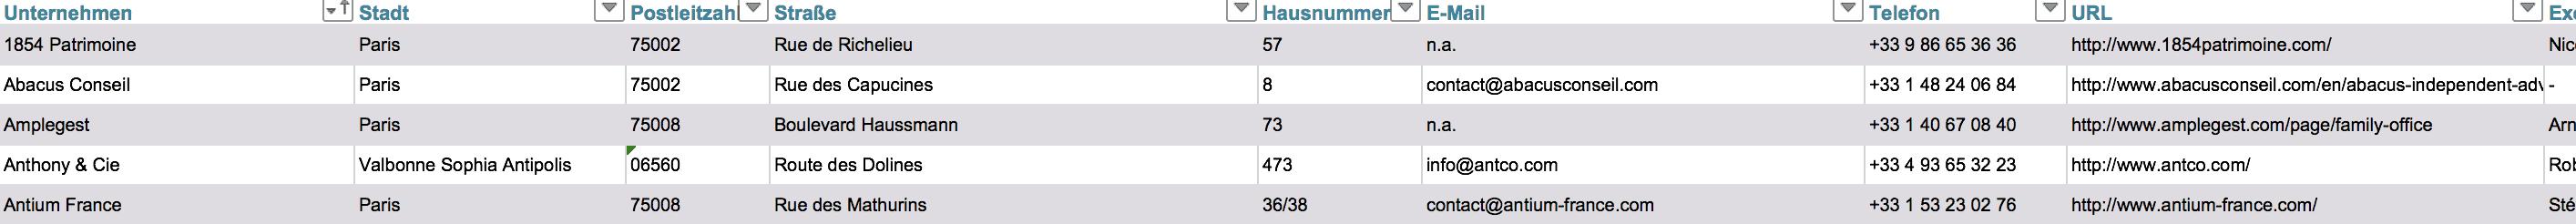 liste multi family offices frankreich